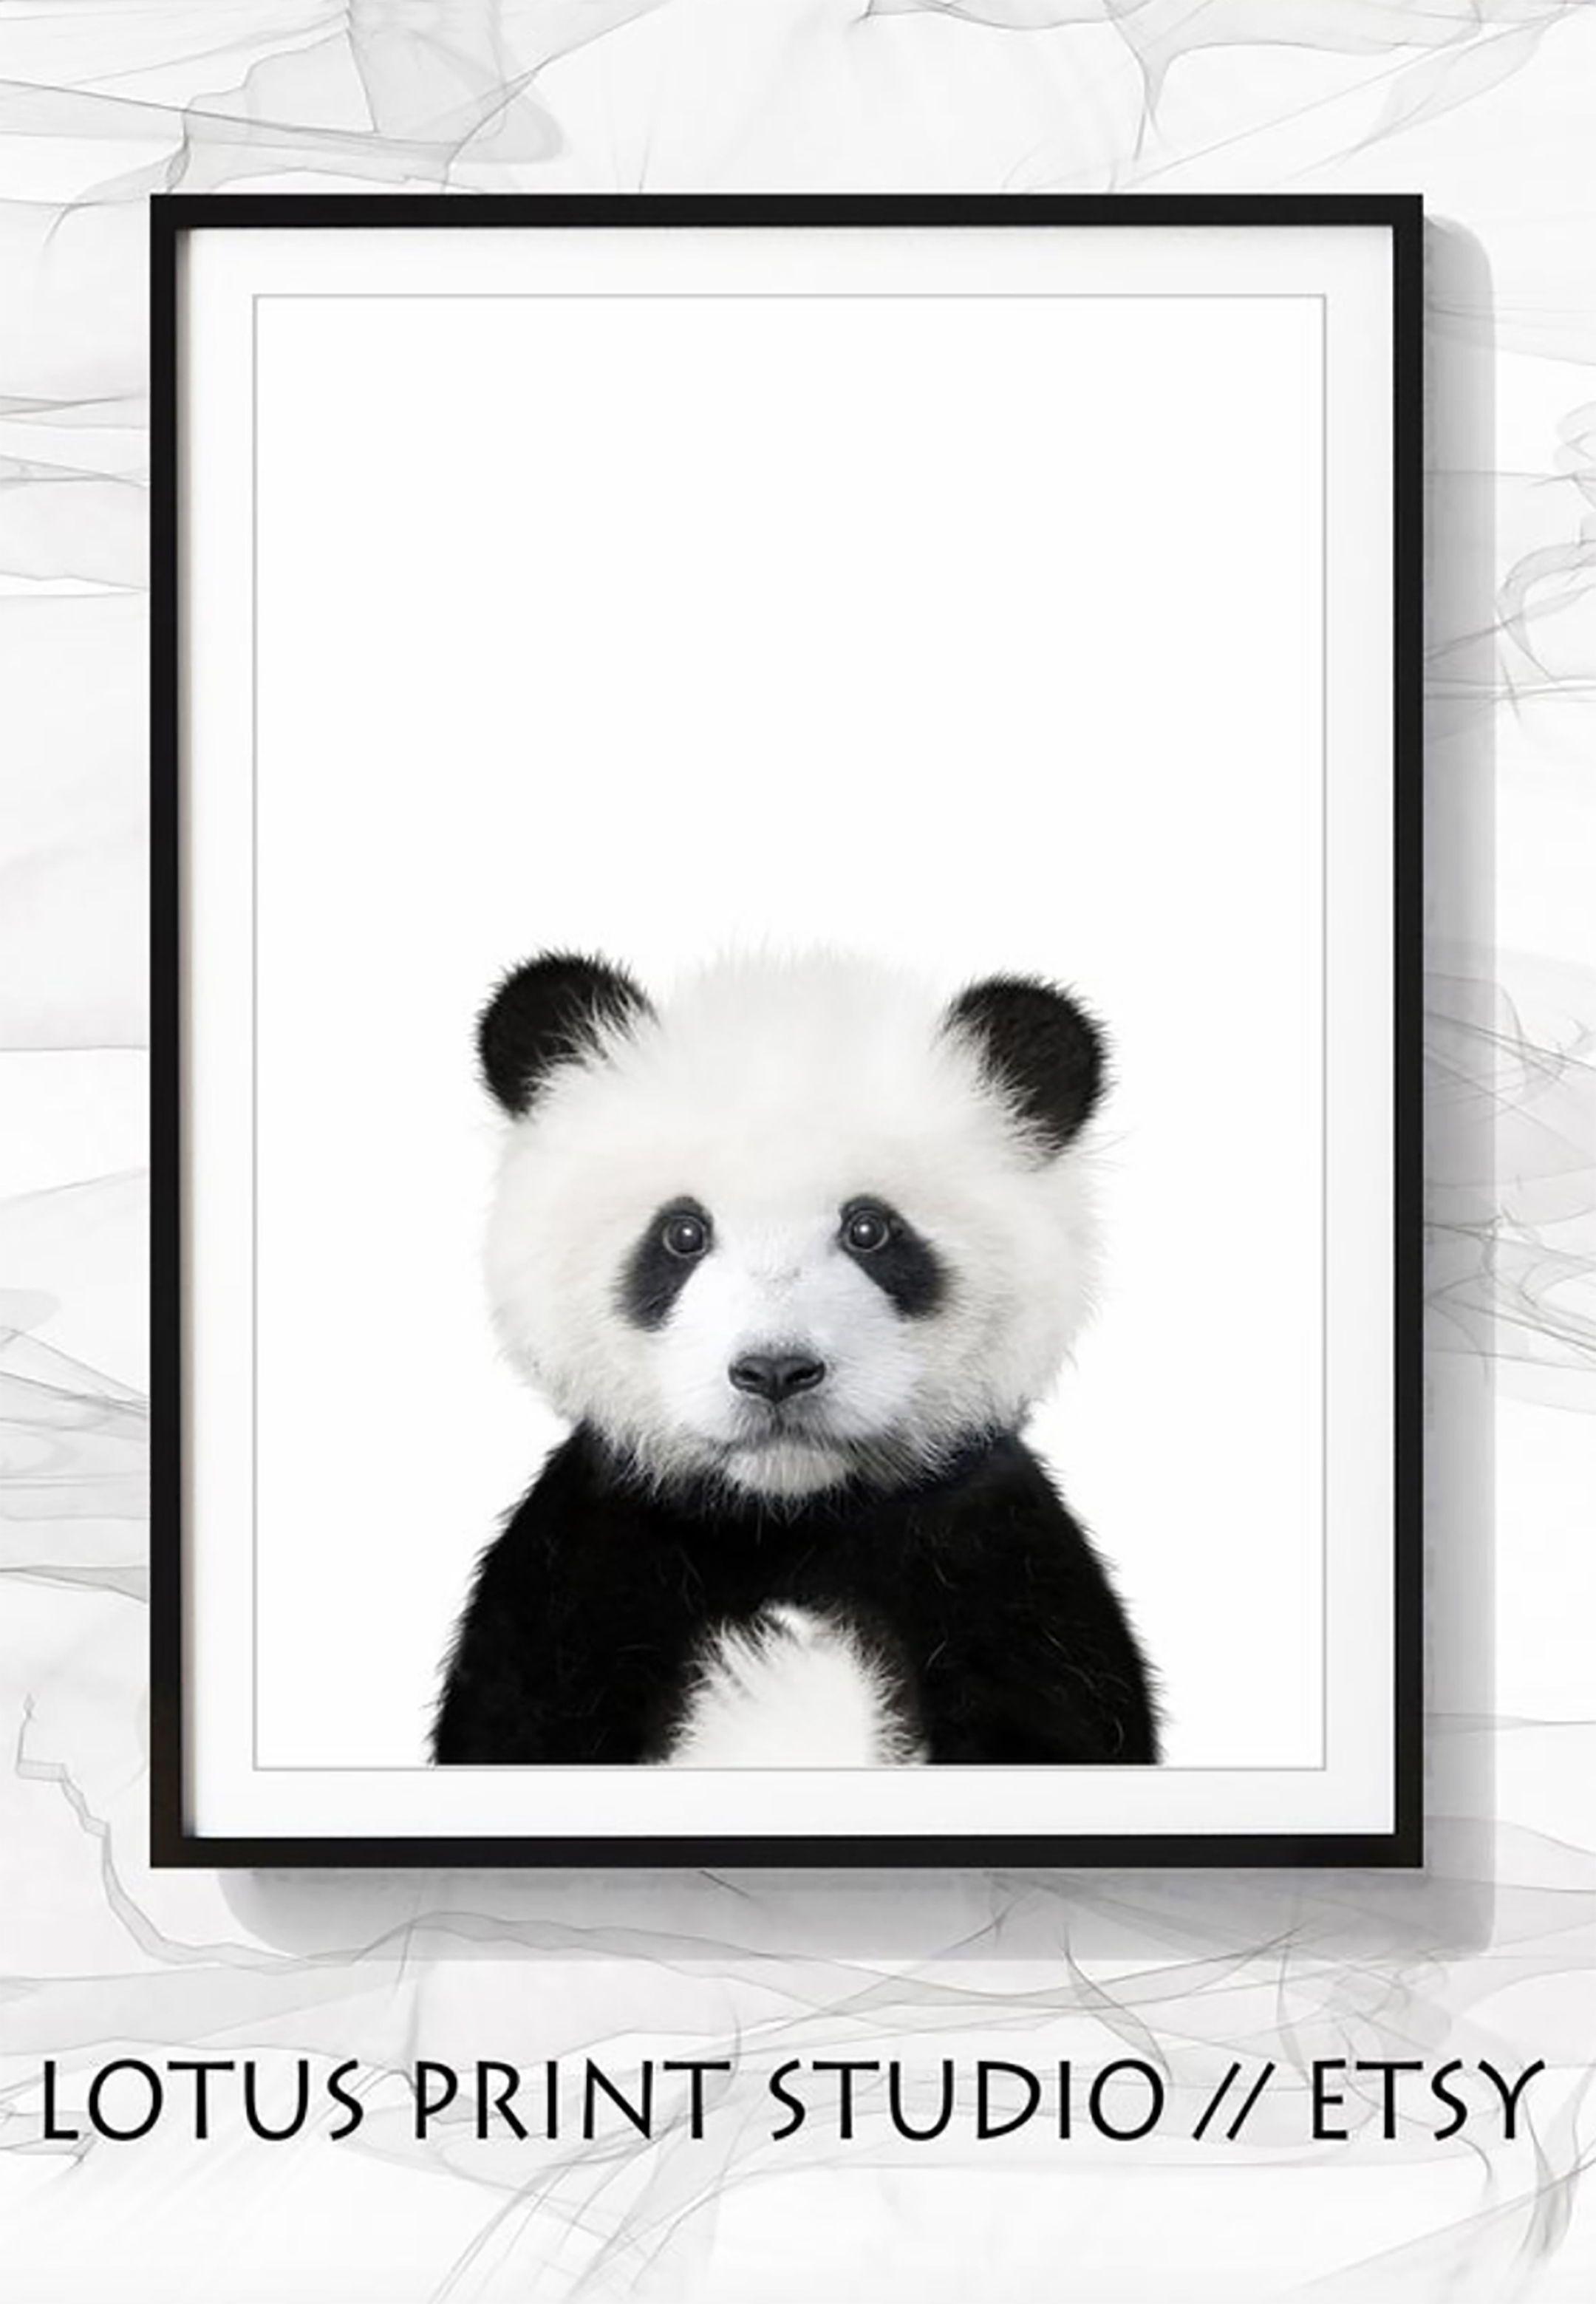 Panda Bear Print, Woodland Animal, DIGITAL DOWNLOAD, Panda Art, Baby Animal Art, Animal Wall Art, Nursery Decor, Nursery Wall Art, #246 #babypandabears